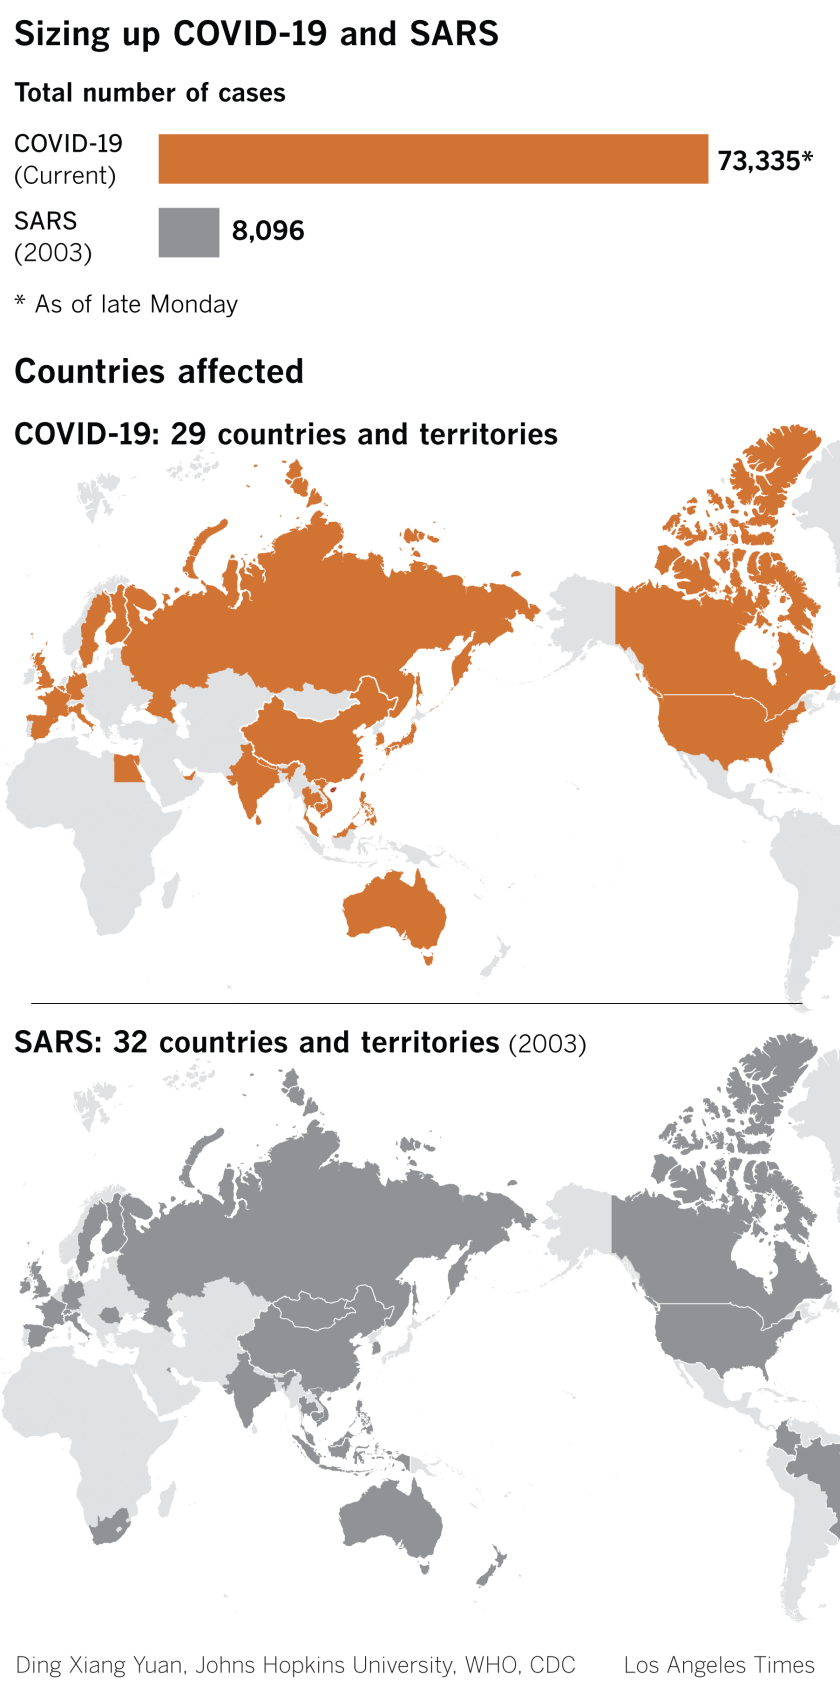 494094-w1-la-me-sars-coronavirus-mon.png